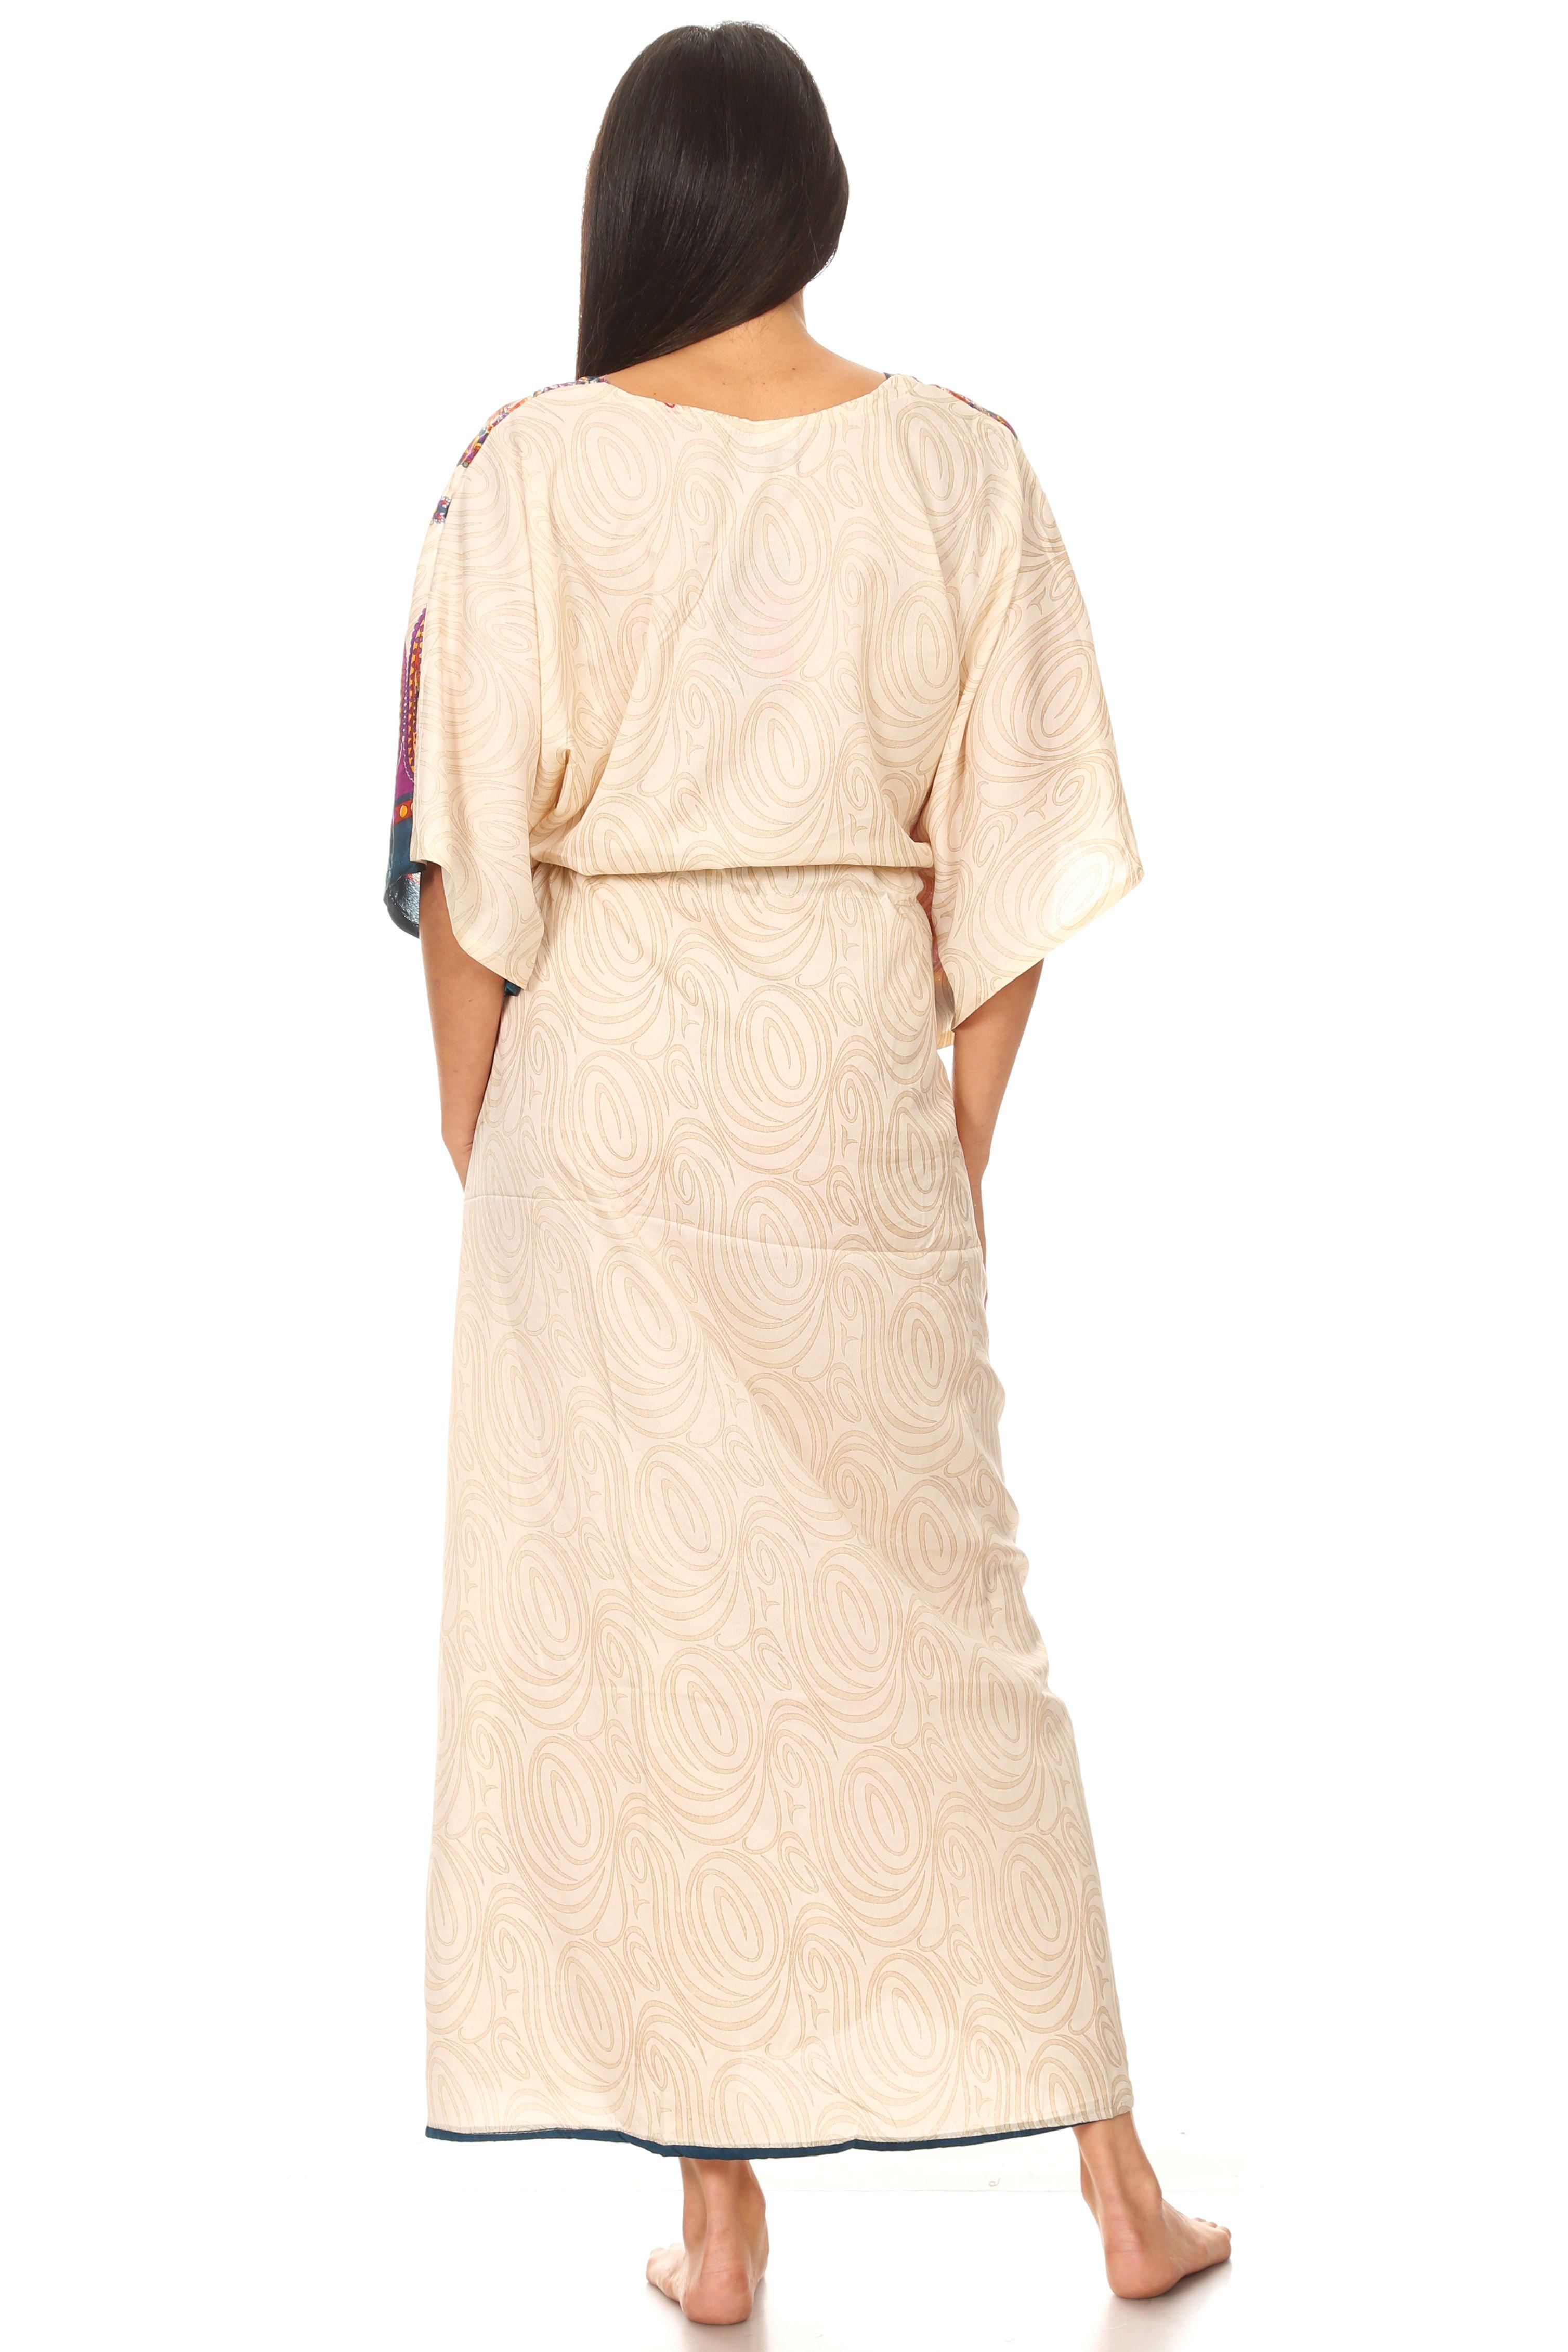 Premiere Fashion Caftan Dresses For Women V Neck Long Kaftan Cover Up Summer Maxi Dress Walmart Com Summer Maxi Dress Maxi Dresses Summer Casual Vintage Maxi Dress [ 4524 x 3016 Pixel ]